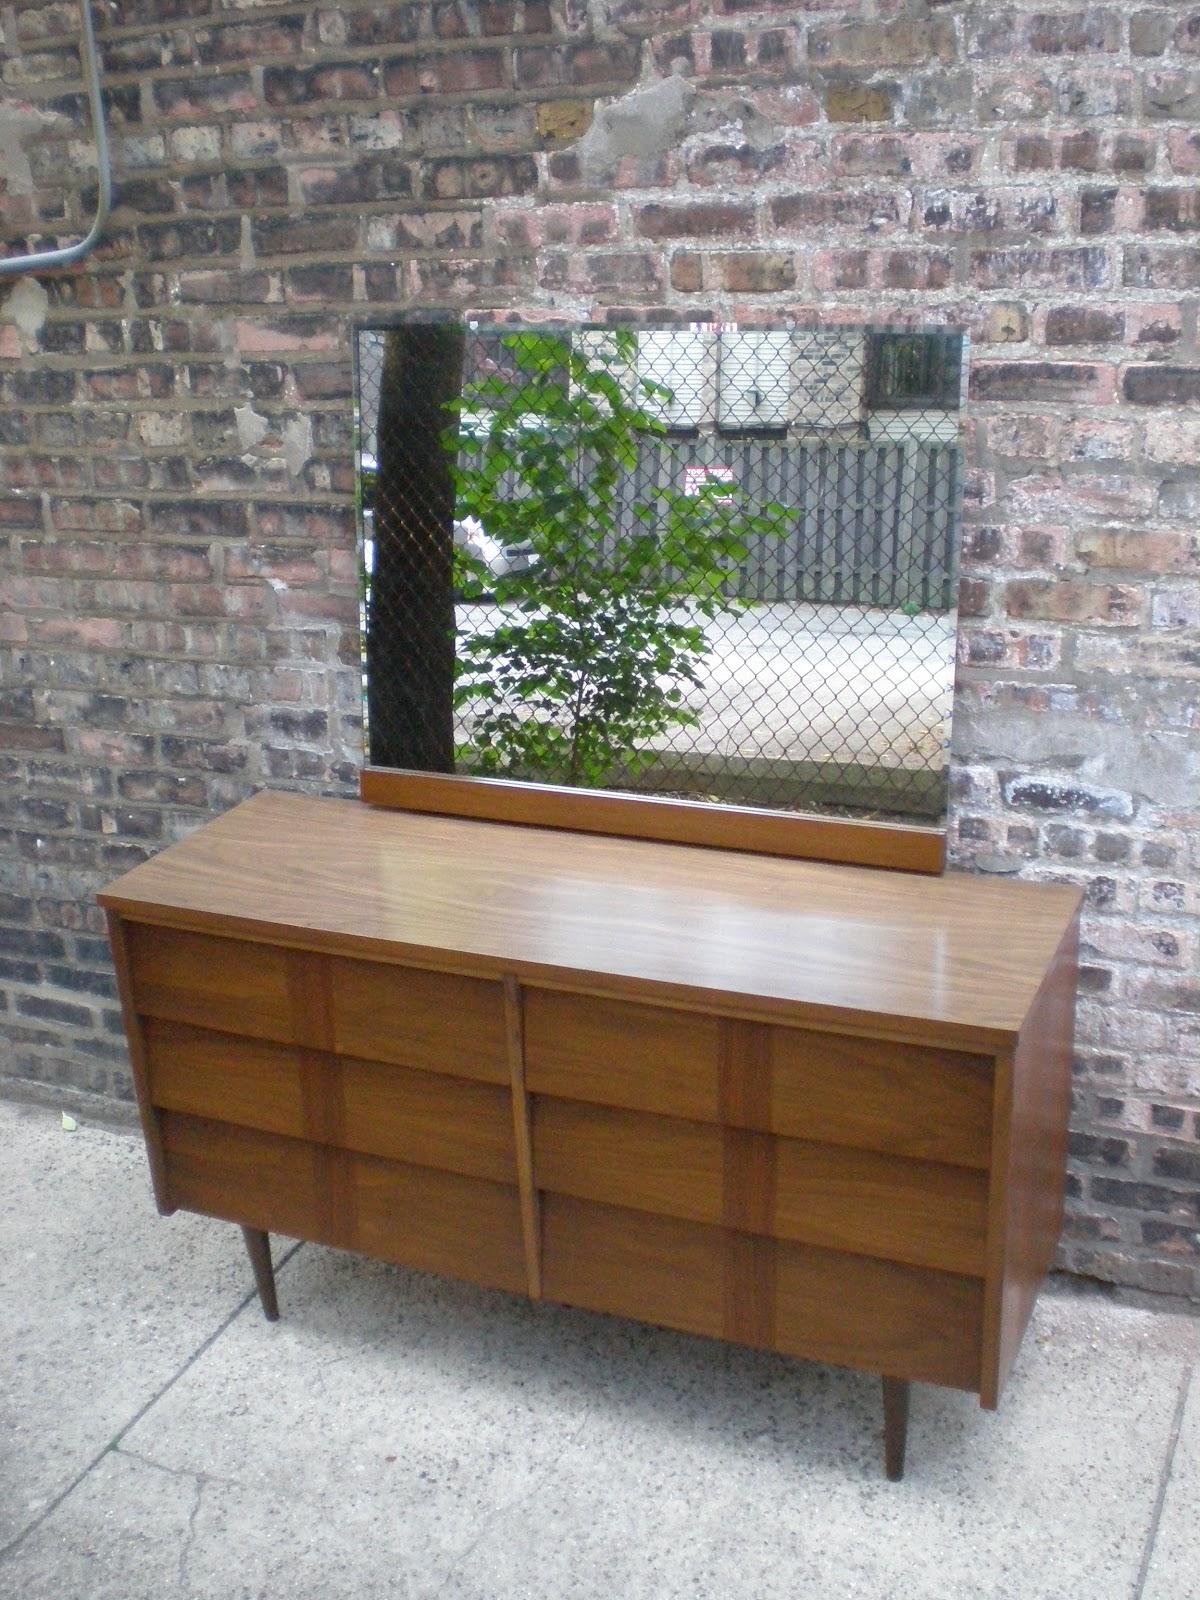 Ordinaire Ward Furniture Co. Lowboy Dresser With Mirror